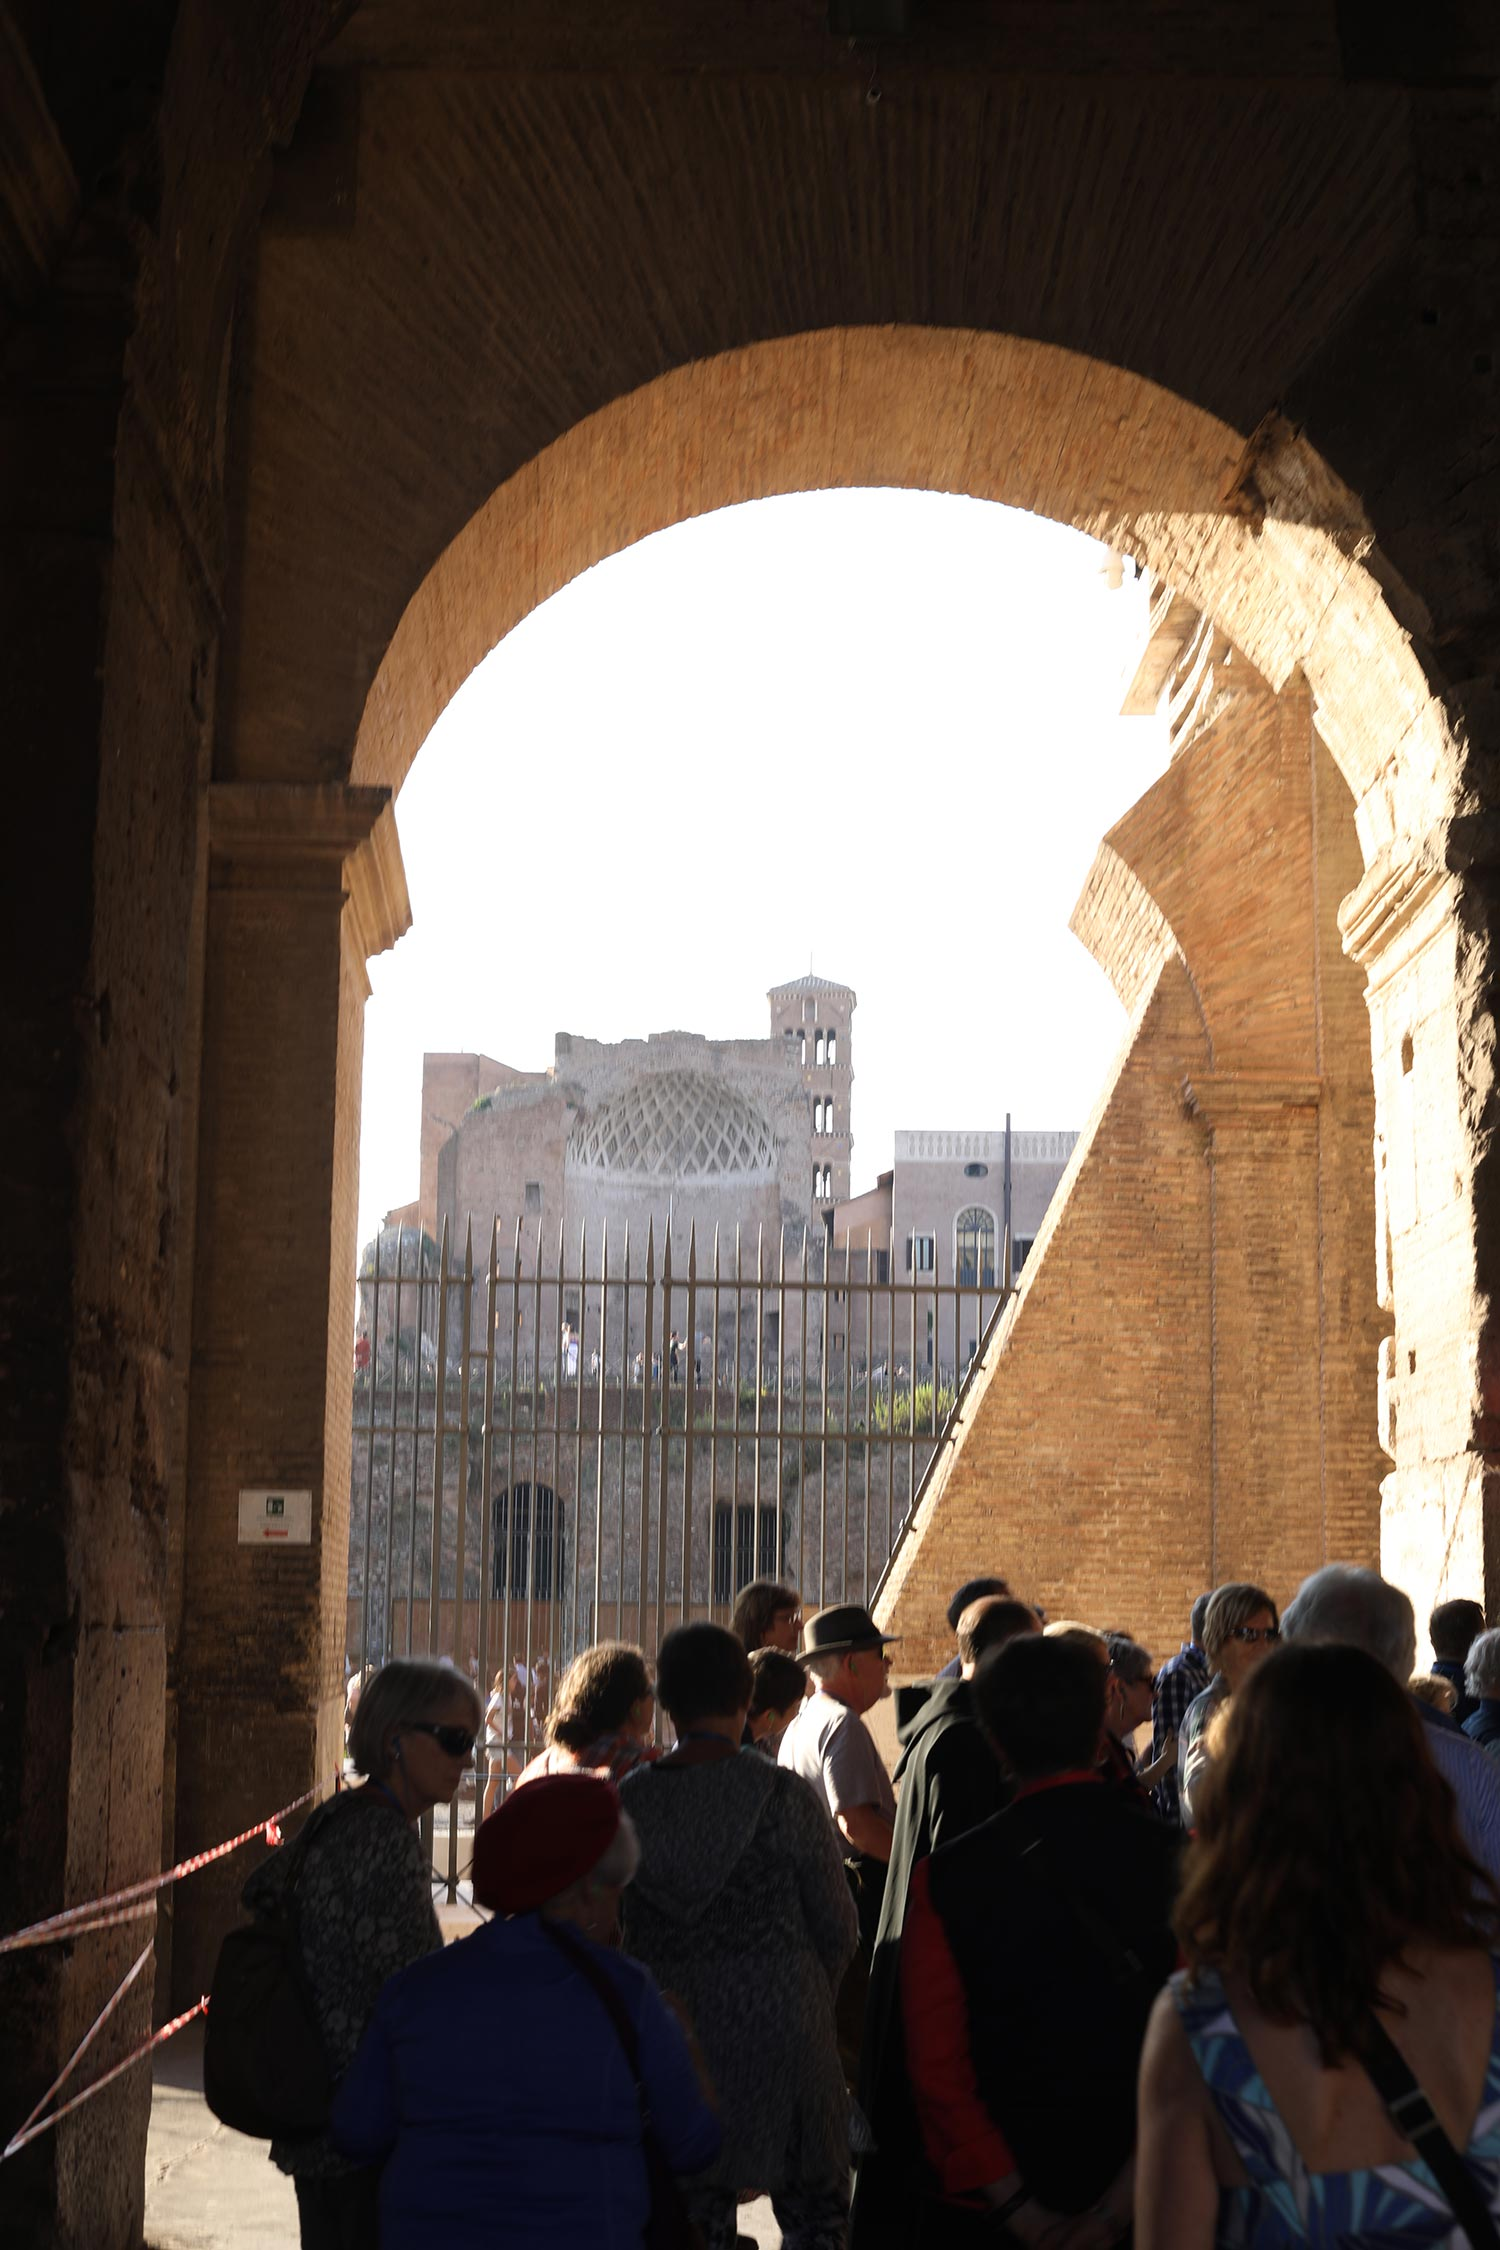 Pilgrimage_Rome_3490_Colo.jpg